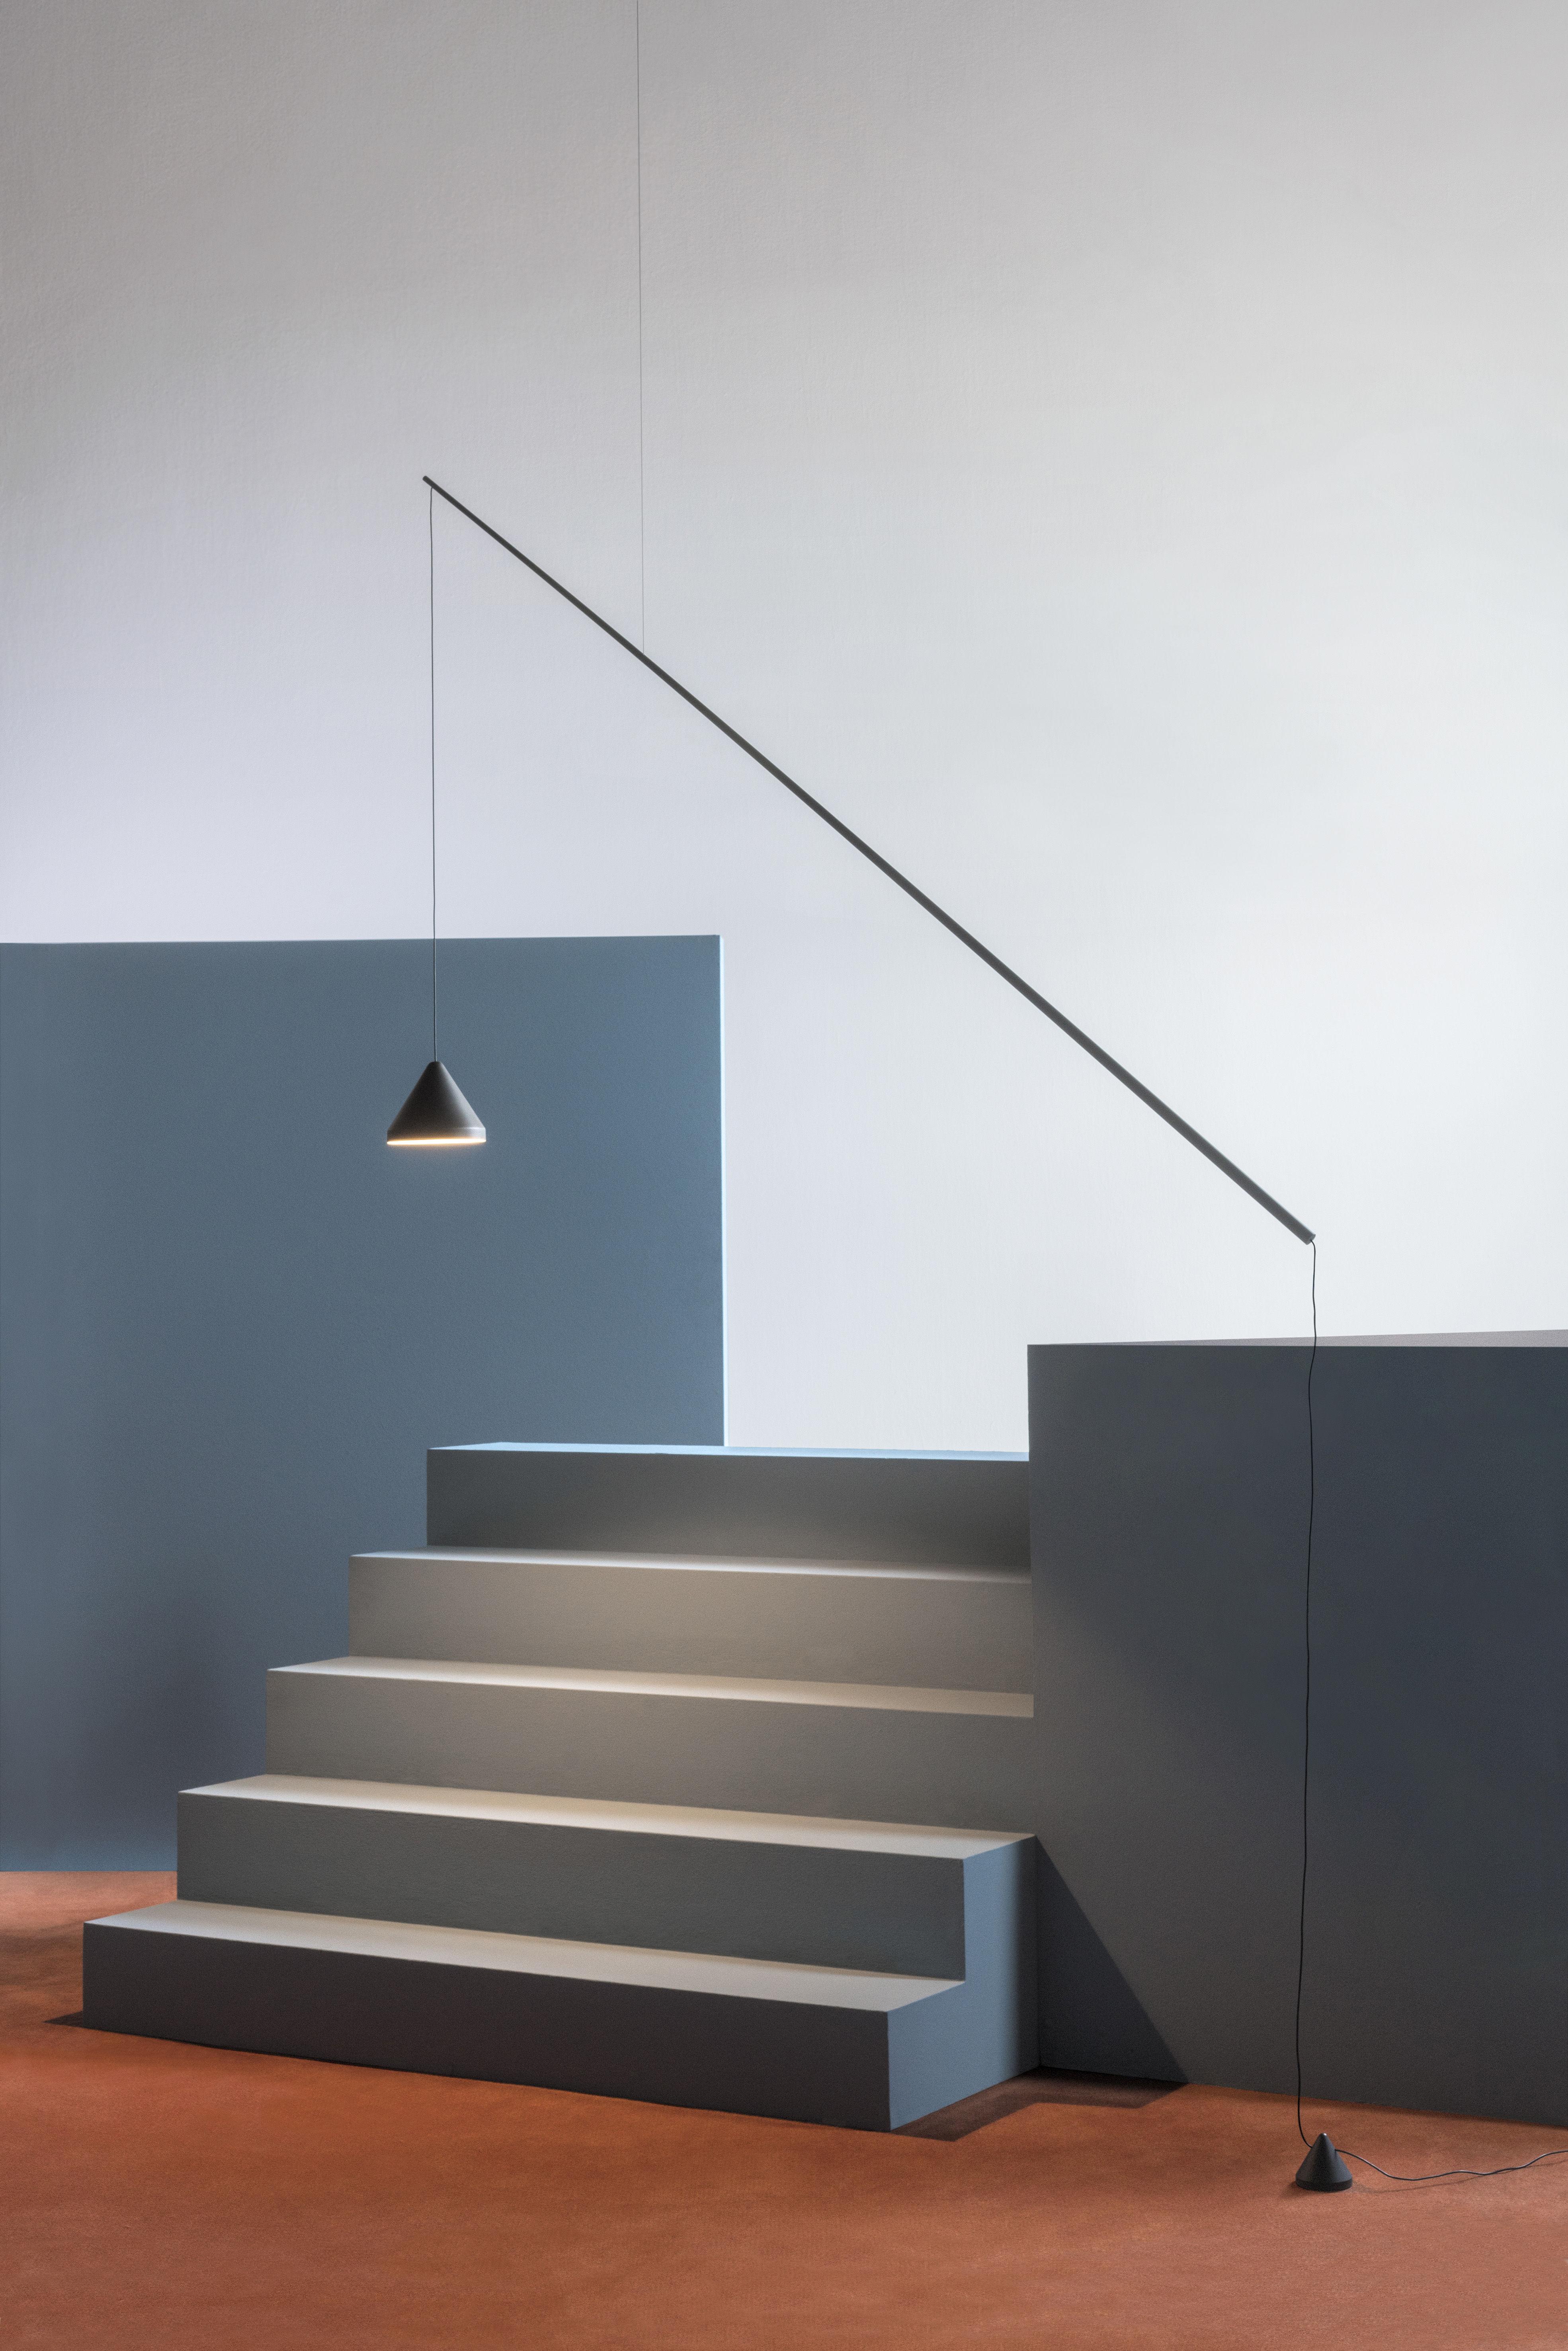 lampadaire north suspendu orientable led laqu graphite mat vibia made in design. Black Bedroom Furniture Sets. Home Design Ideas